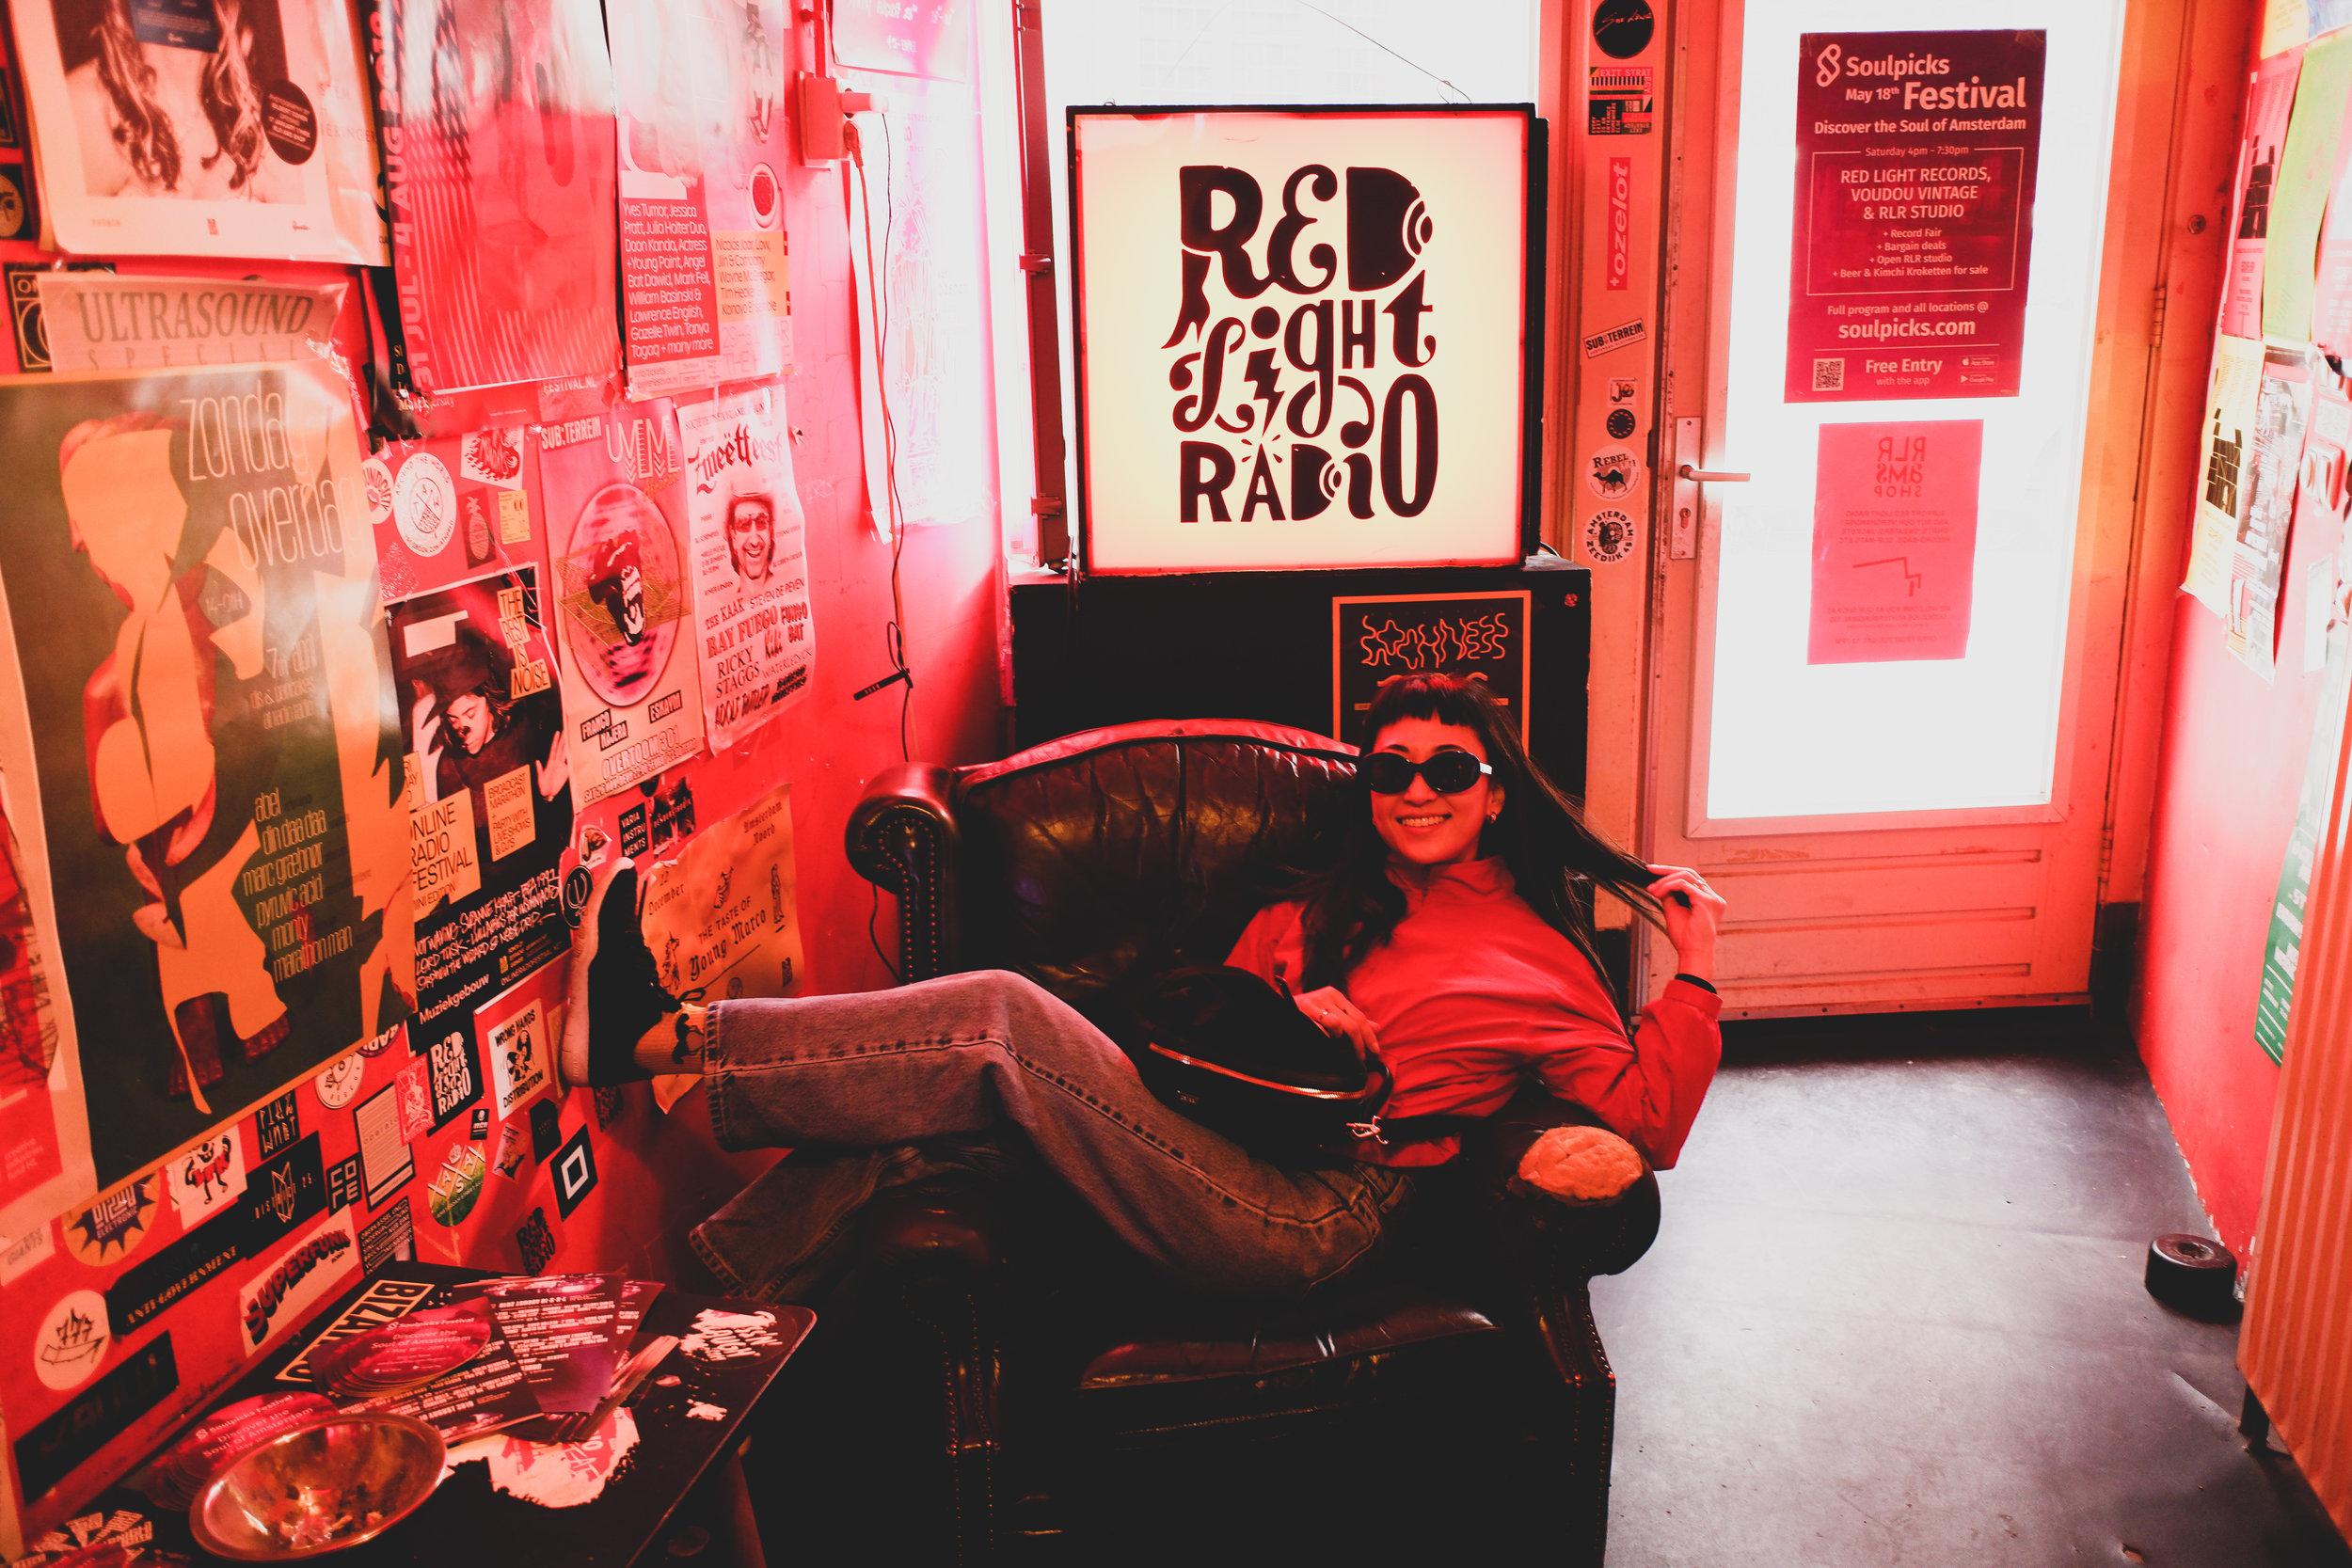 redlightradioj